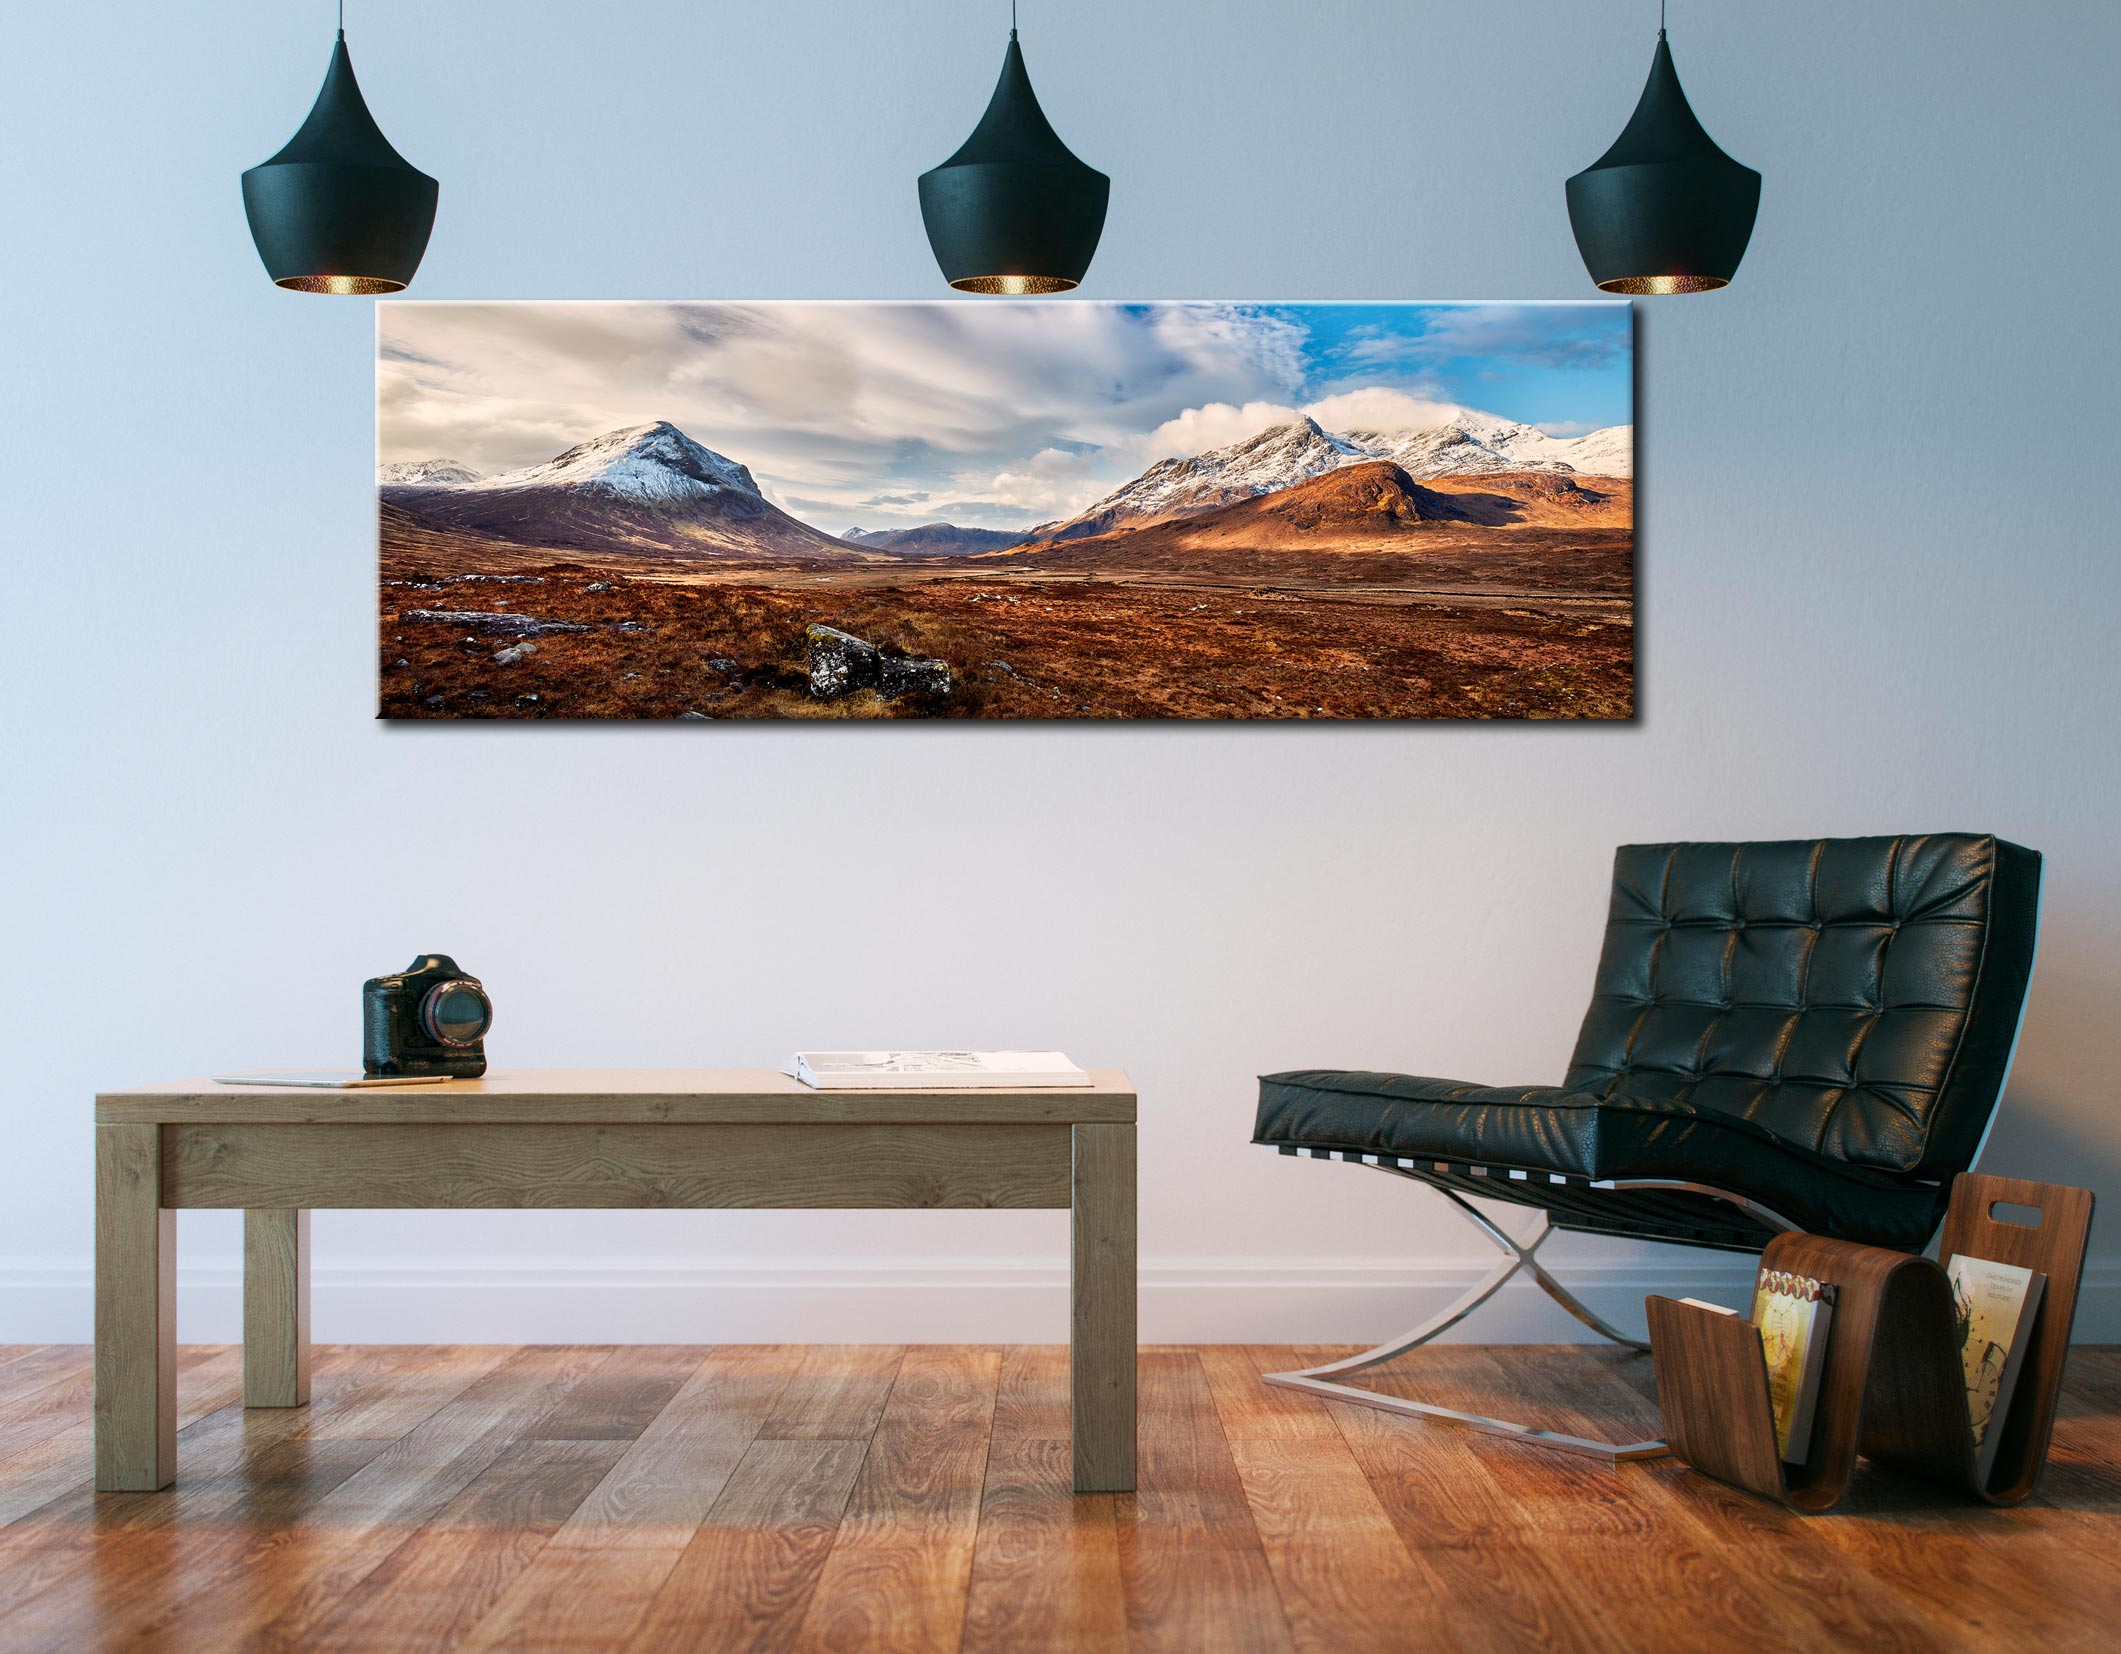 Cuillin Mountains from Glen Sligachan - Canvas Prints Print on Wall